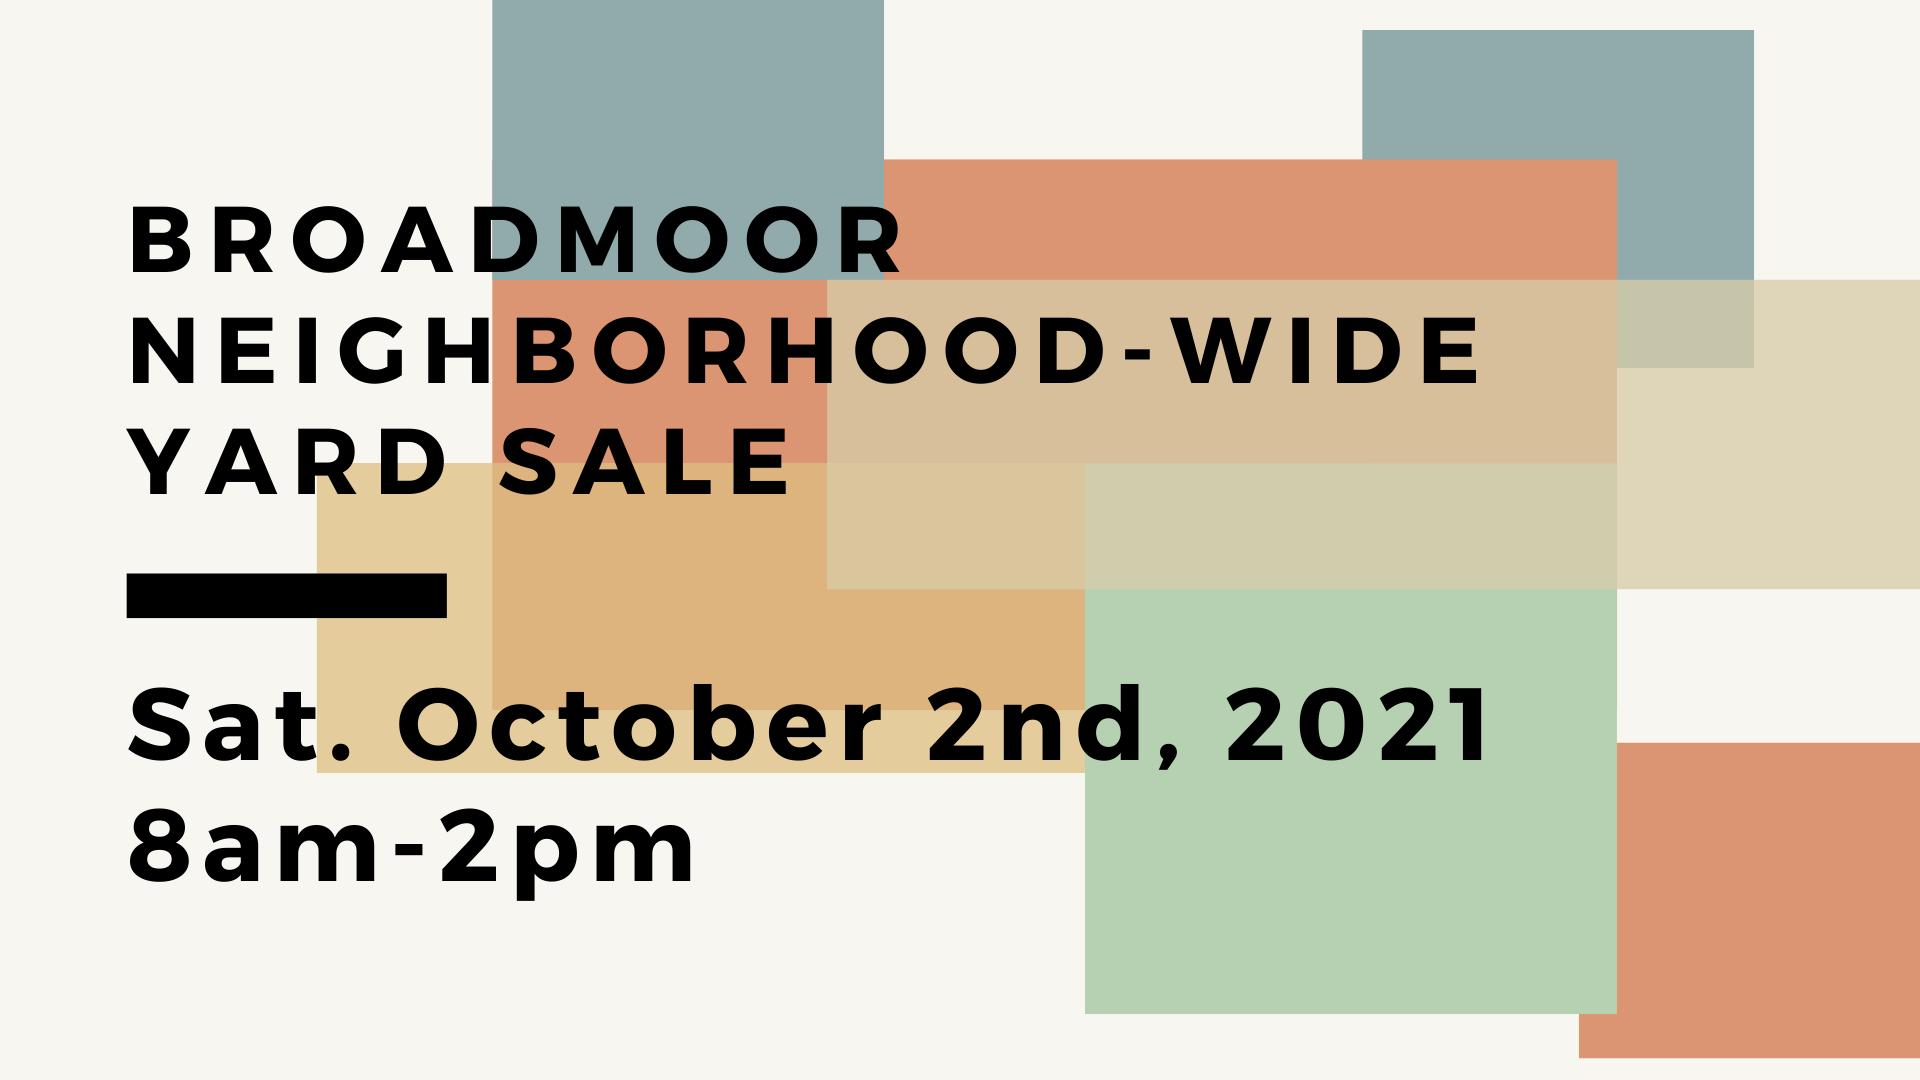 Broadmoor Neighborhood Wide yard Sale Saturday October 2 2021 8am - 2pm